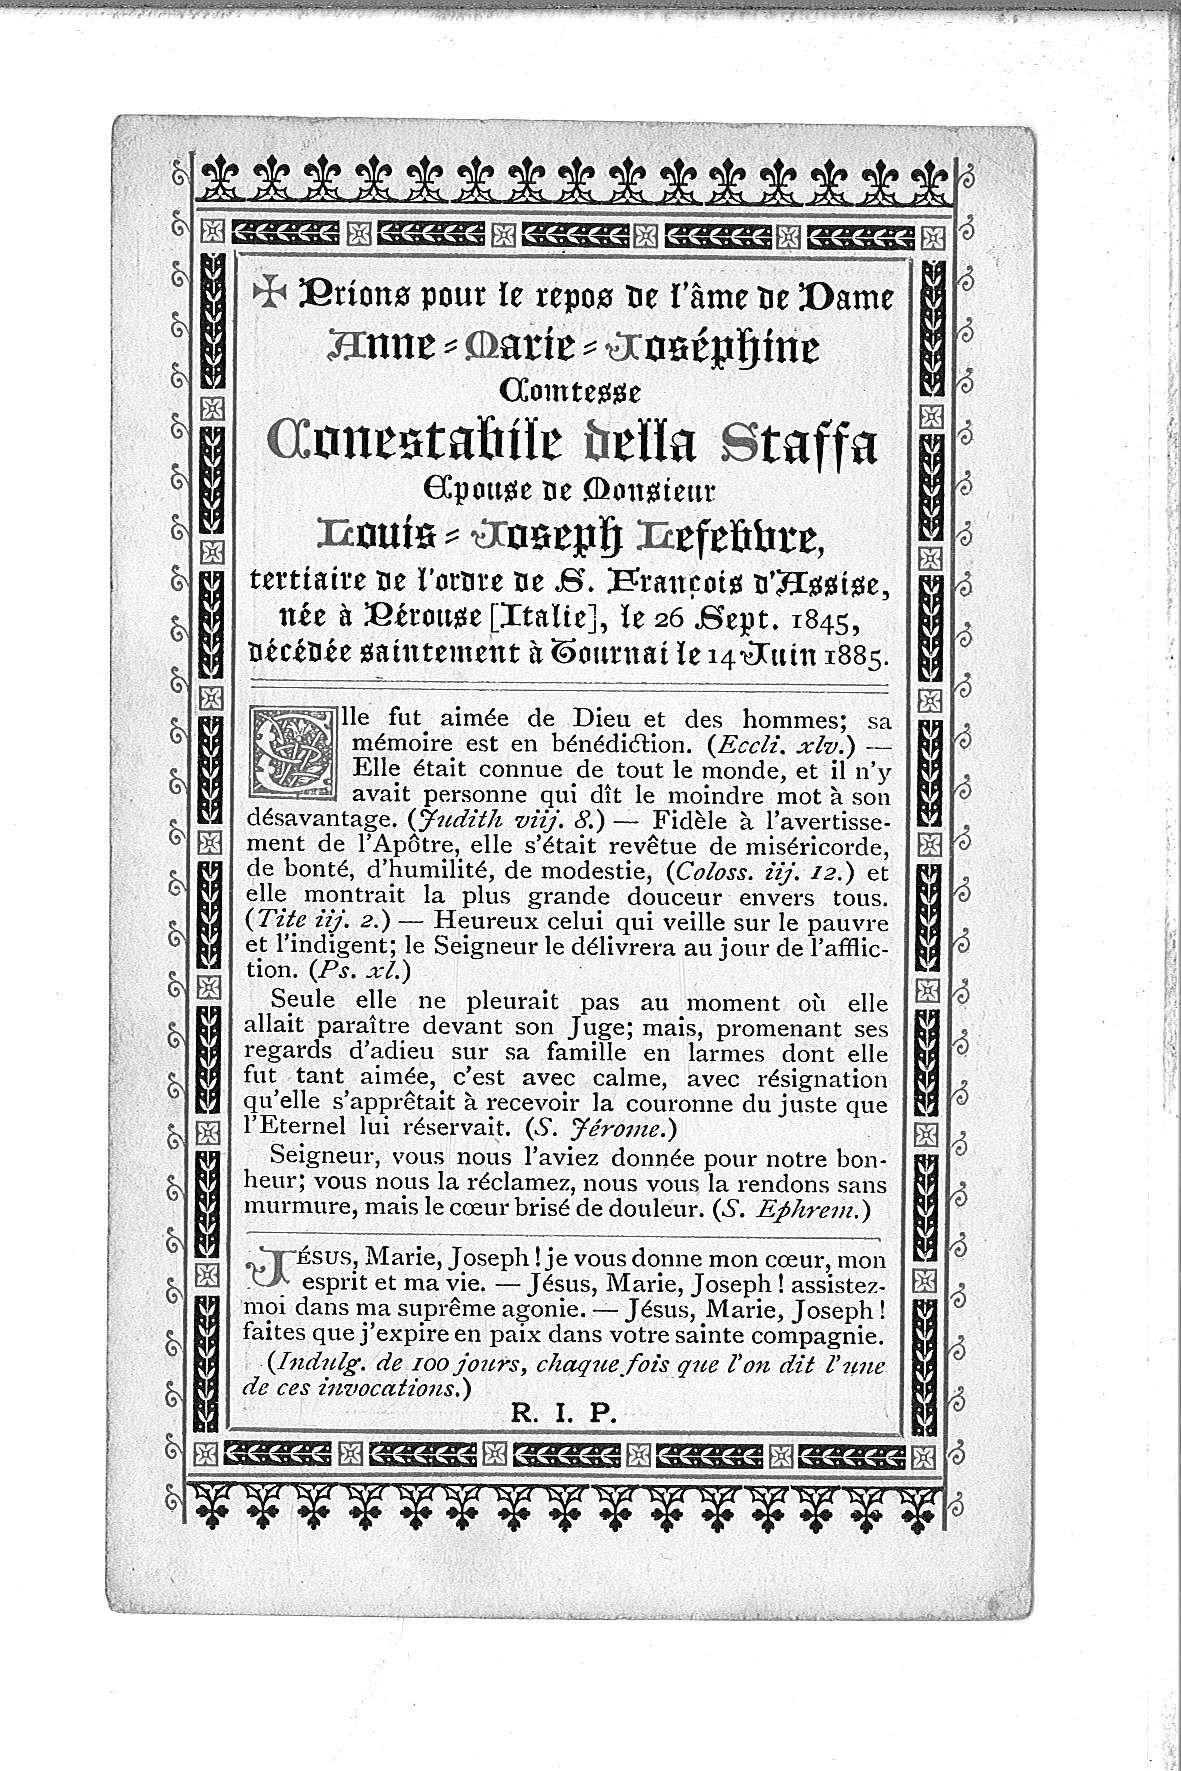 Anne-Marie-Joséphine-(1885)-20121030111738_00061.jpg